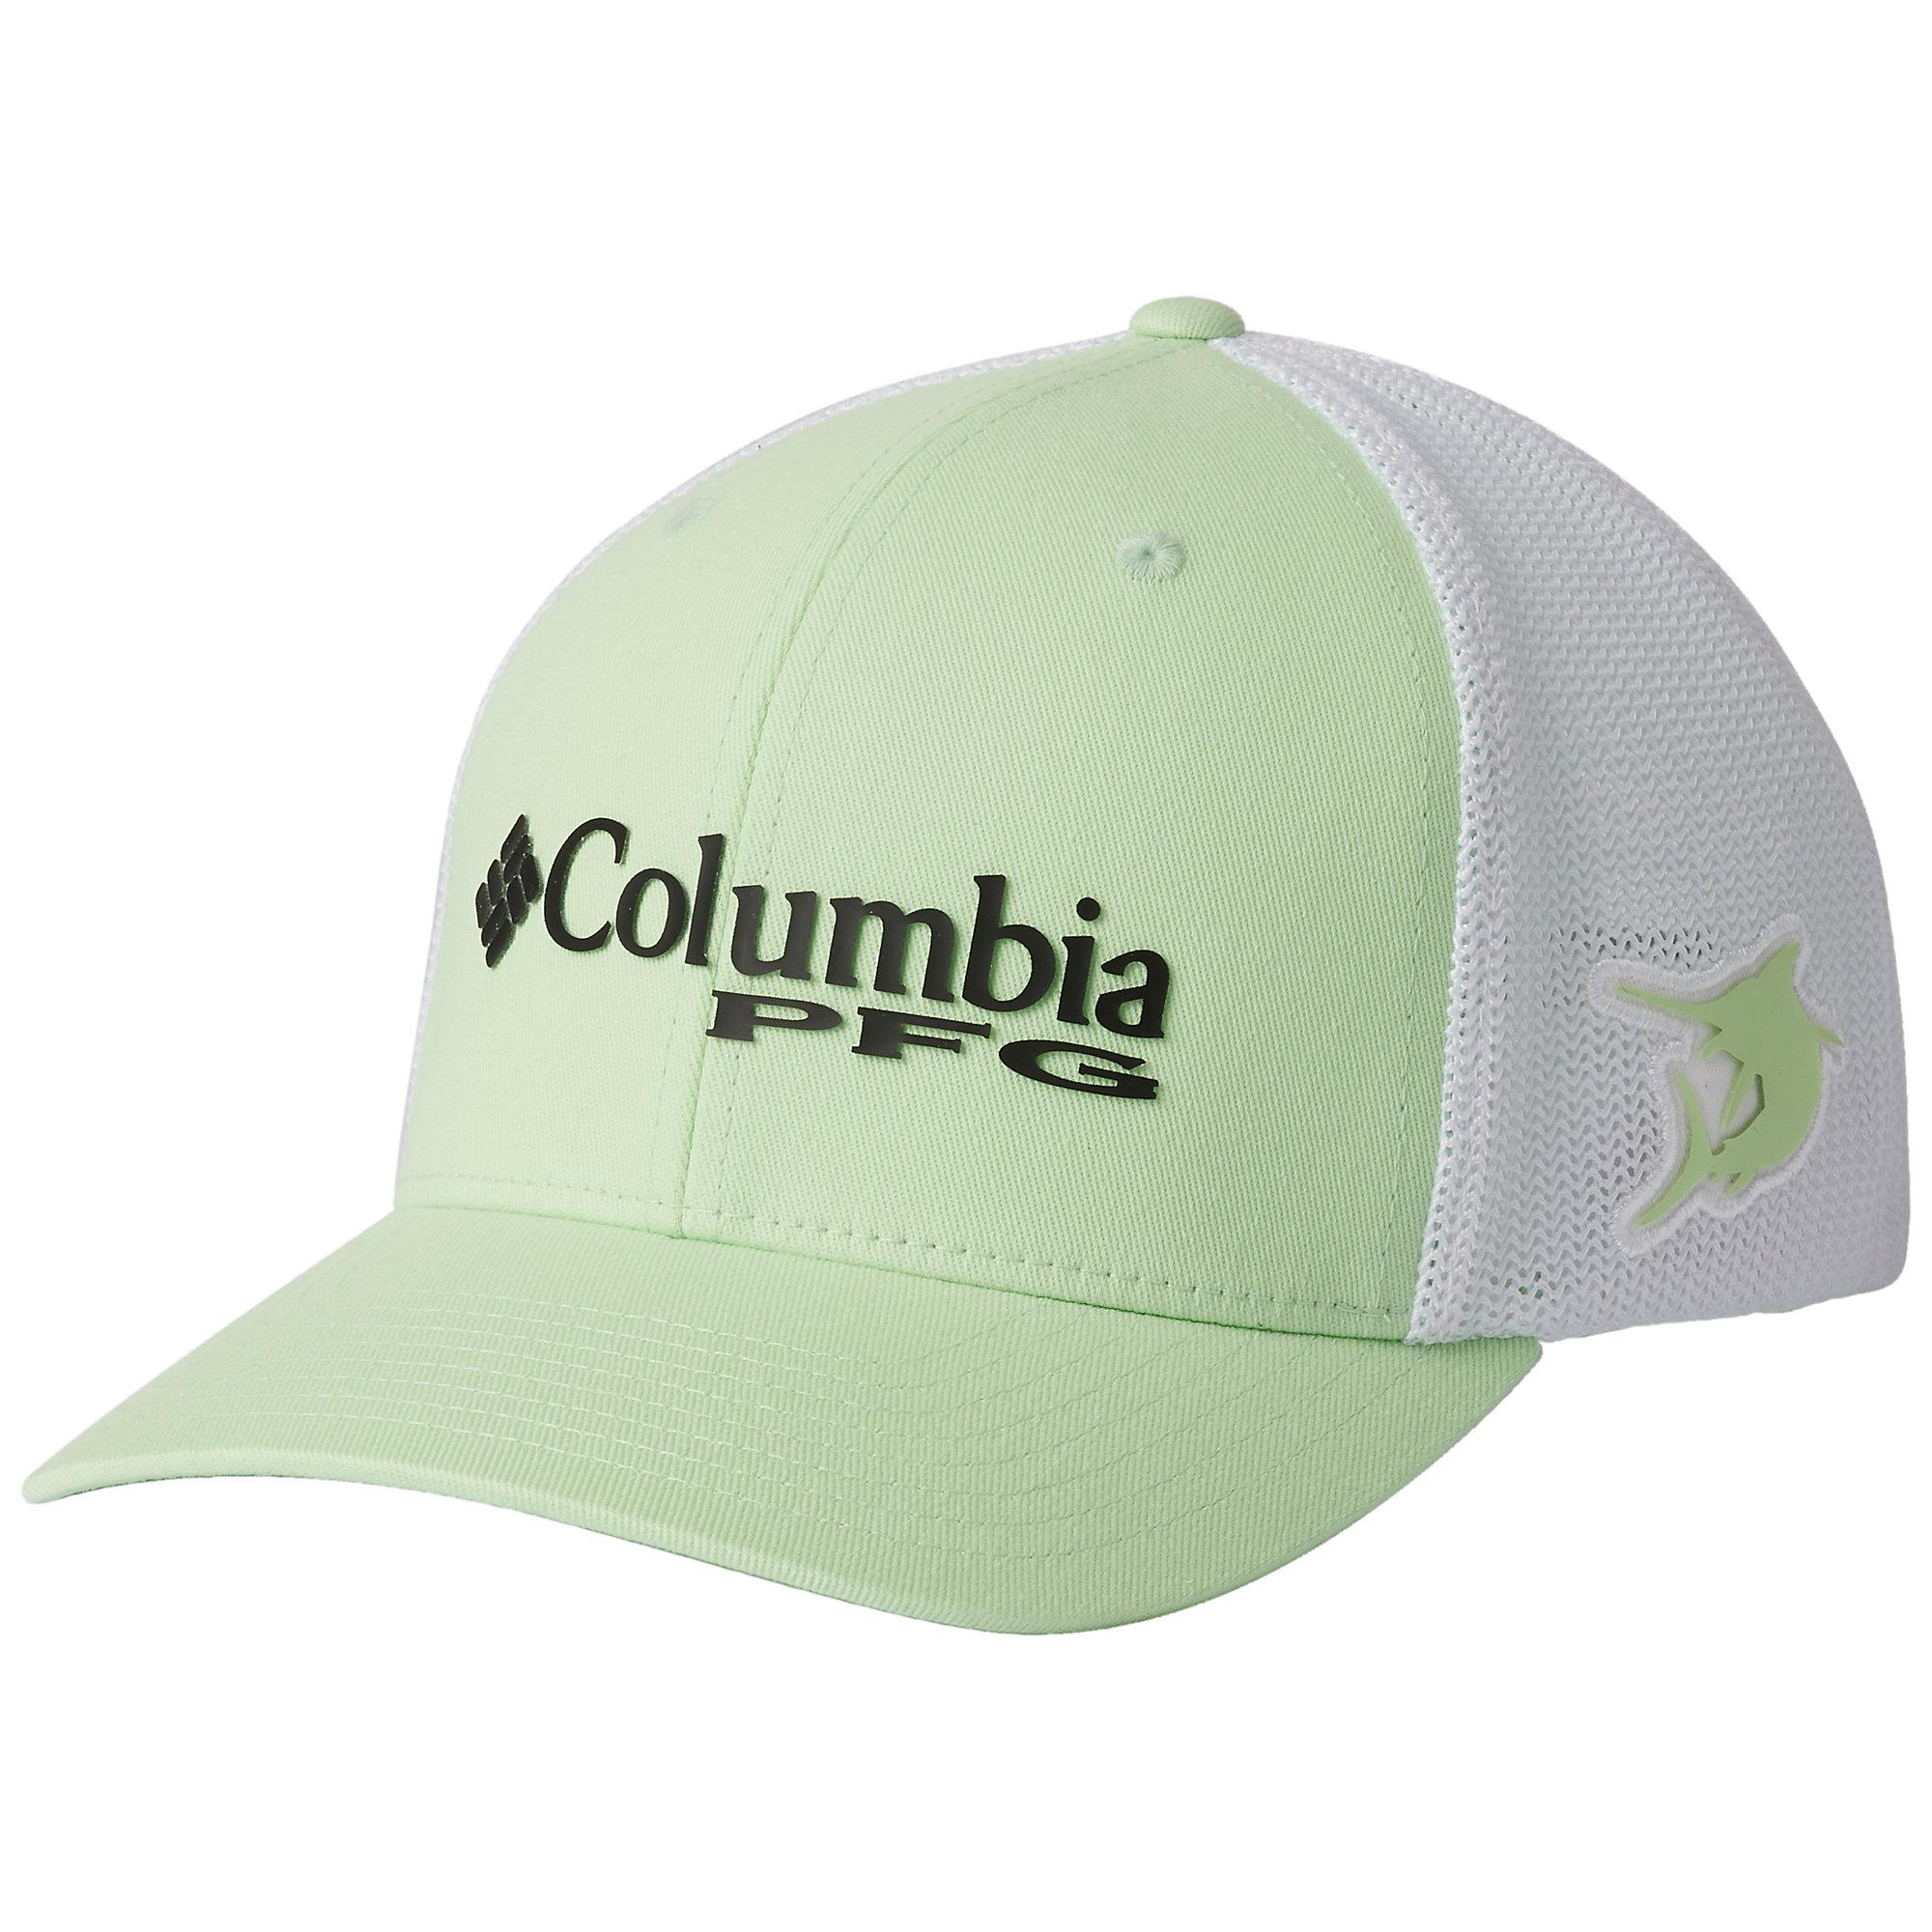 Columbia PFG Mesh Ball Cap